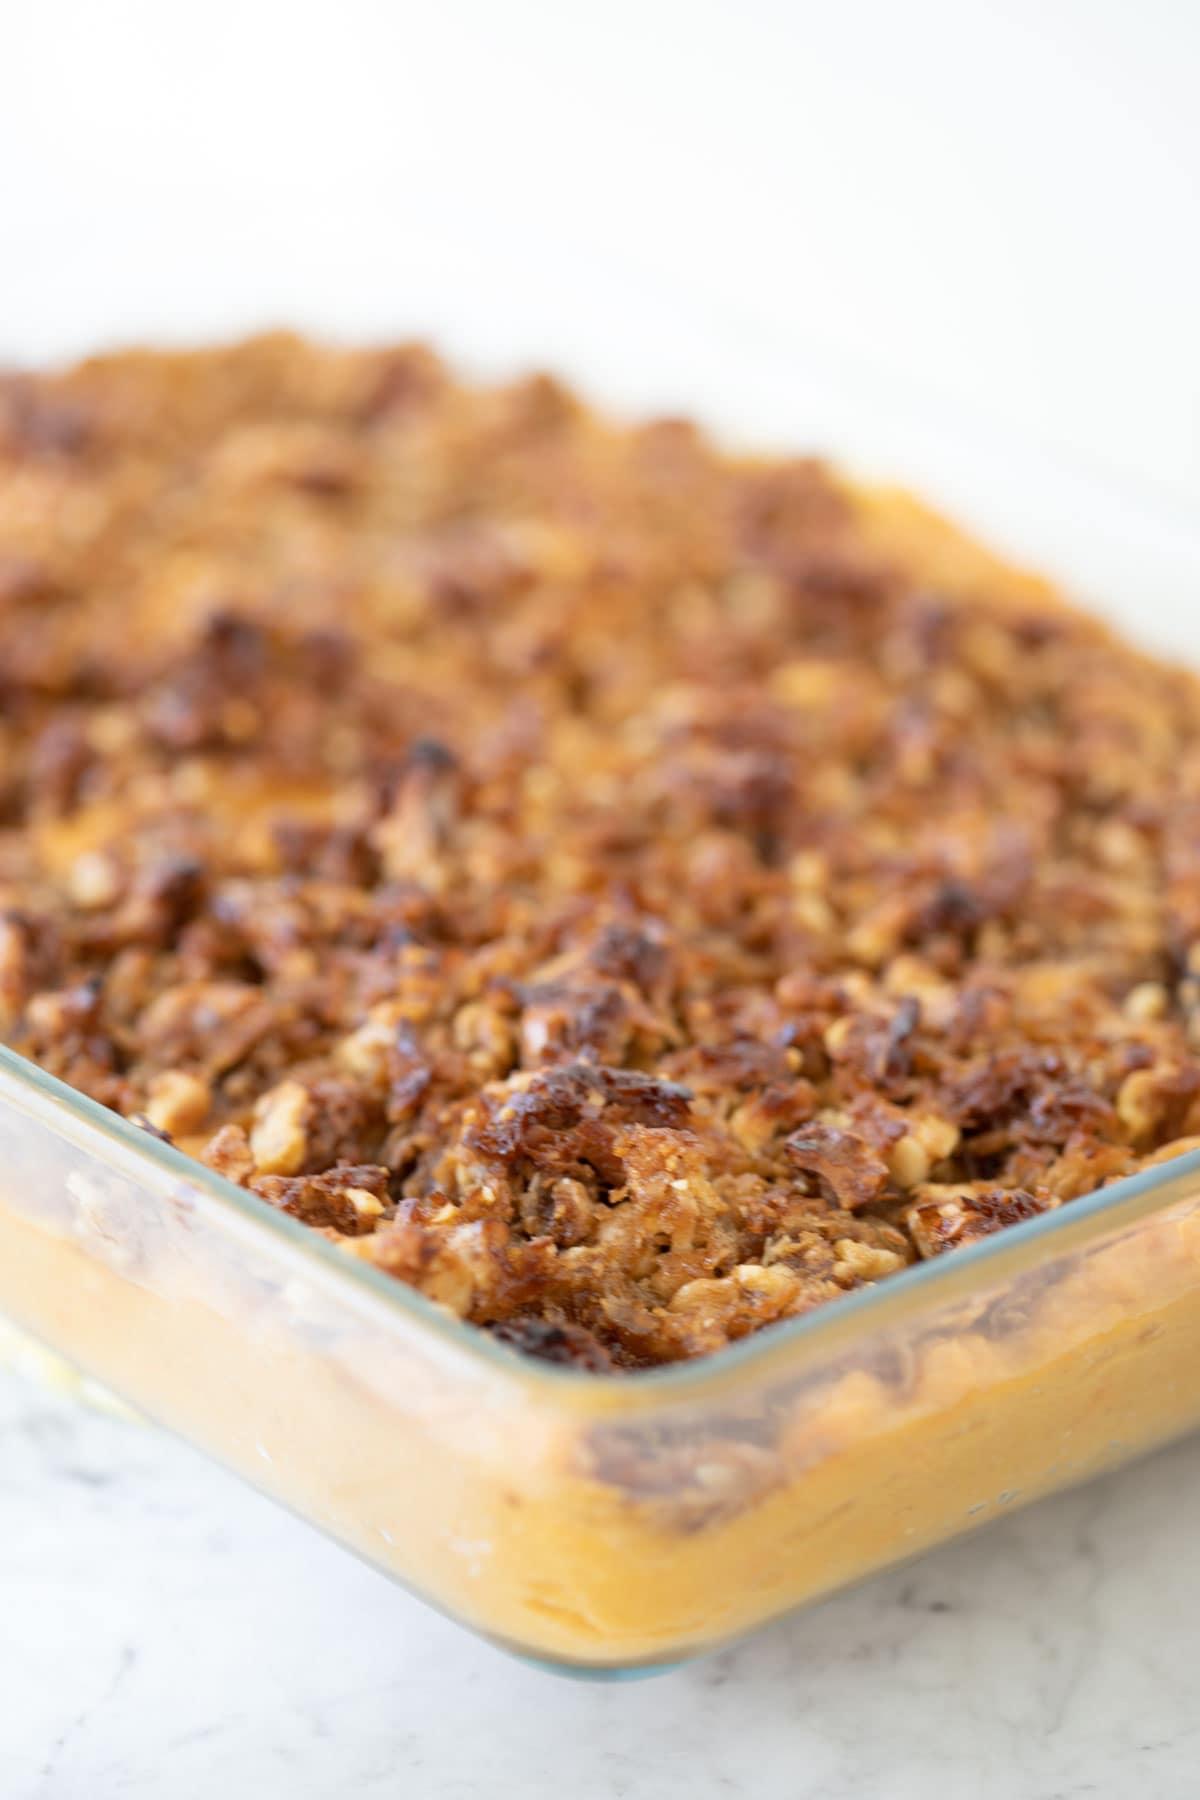 sweet potato souffle with walnuts